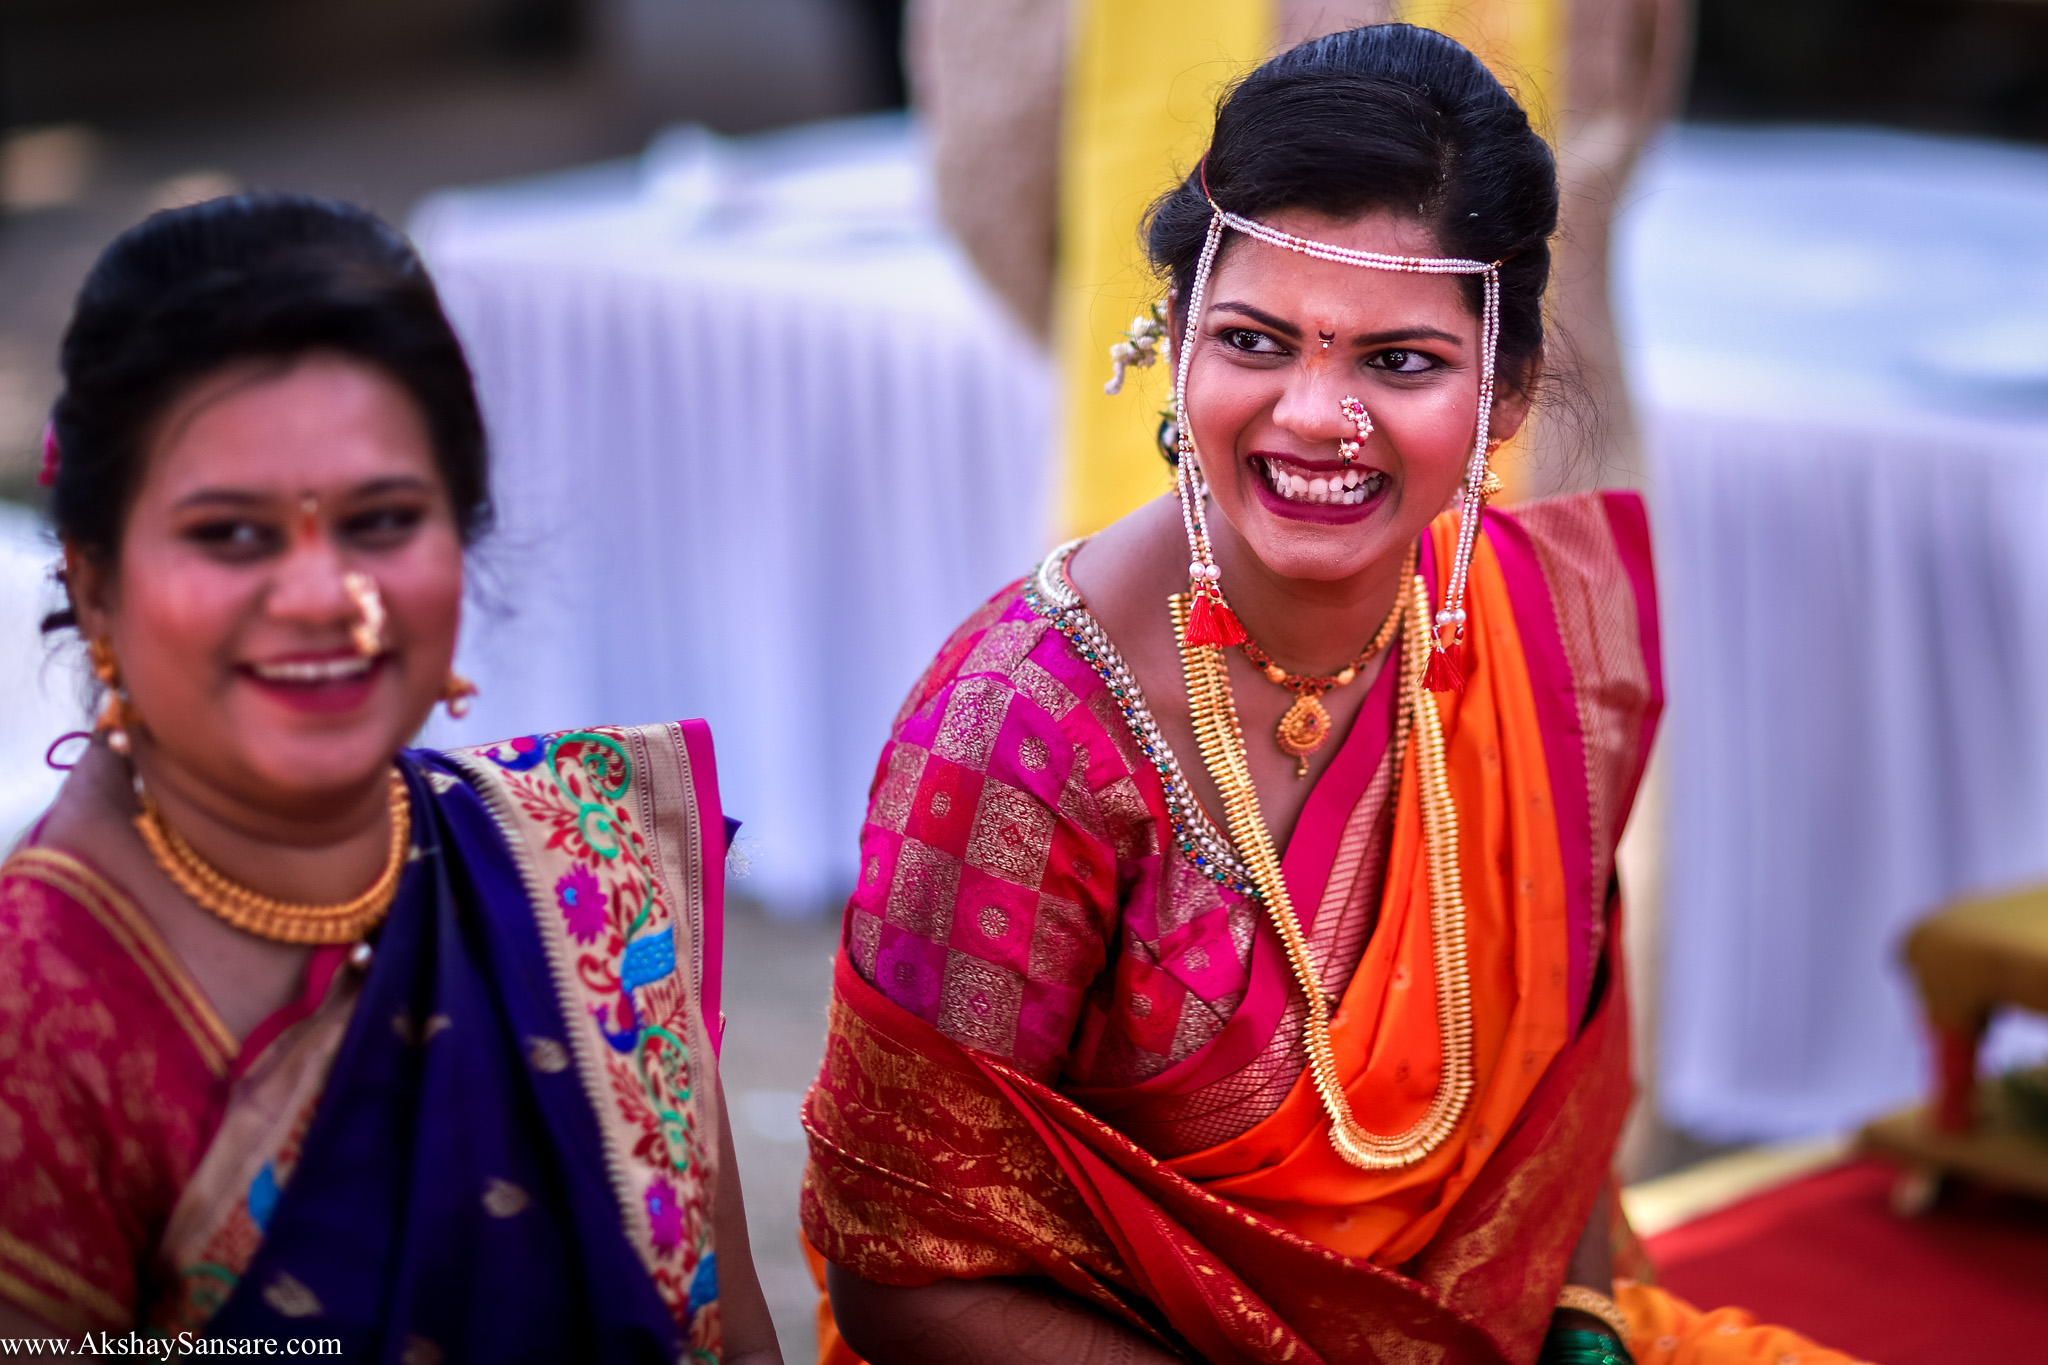 Salil x Kimaya Akshay Sansare Photography Candid wedding Photographer in mumbai best(18).jpg